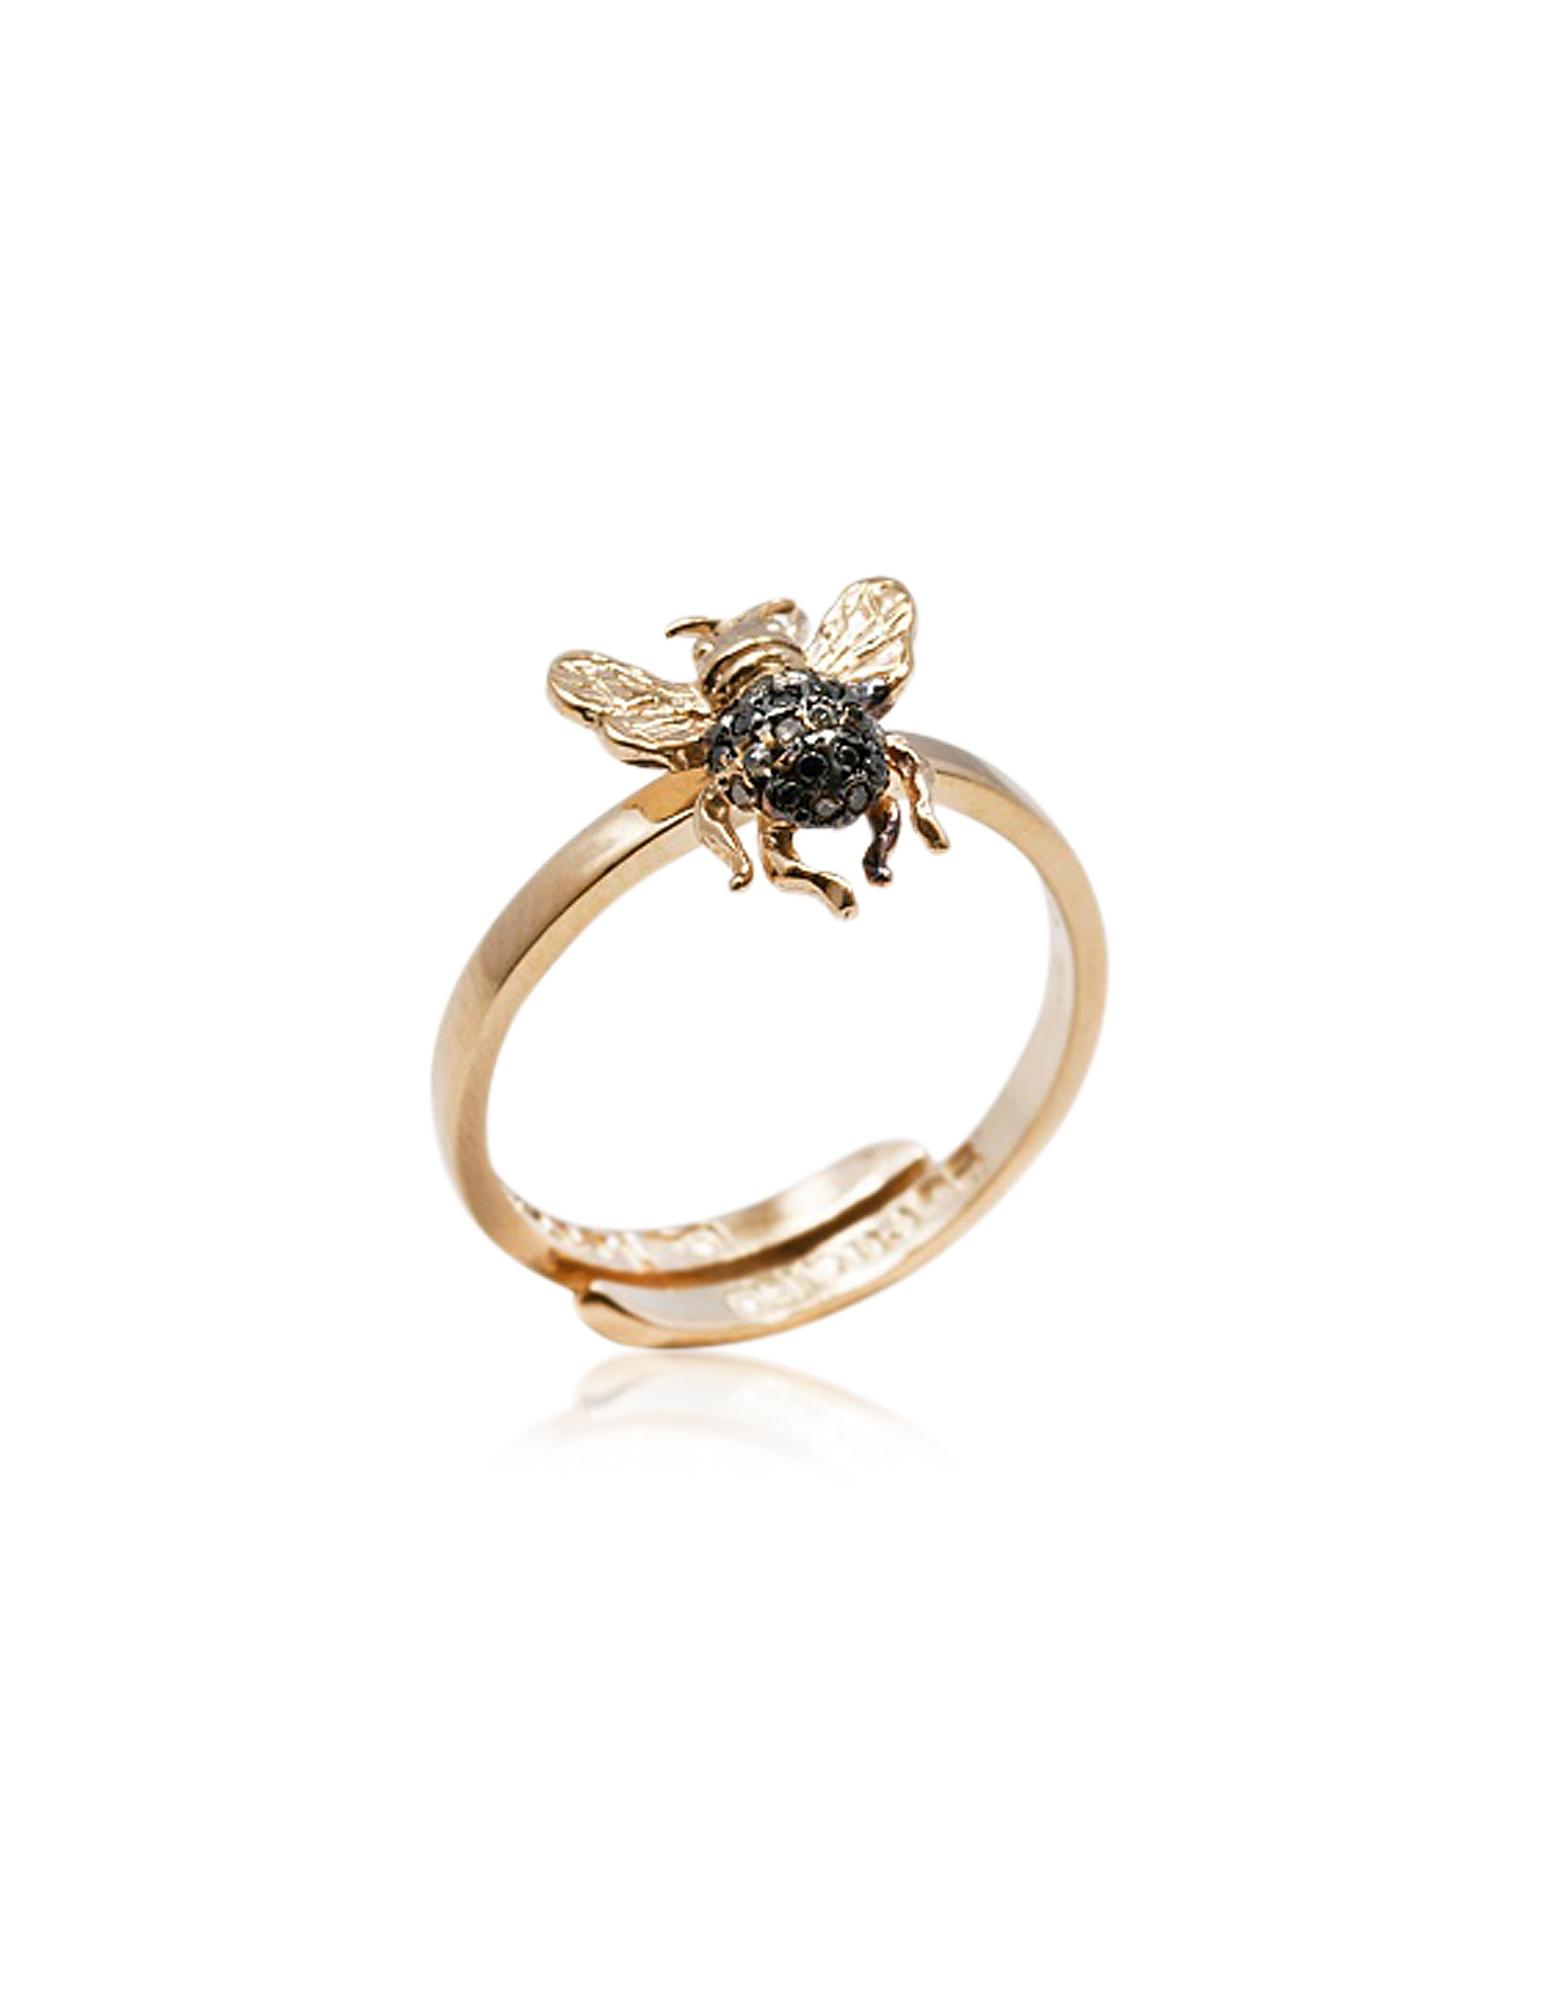 Bernard Delettrez Designer Rings, Mini Bee Gold Band Ring w/ Pavé Black & Cognac Diamonds